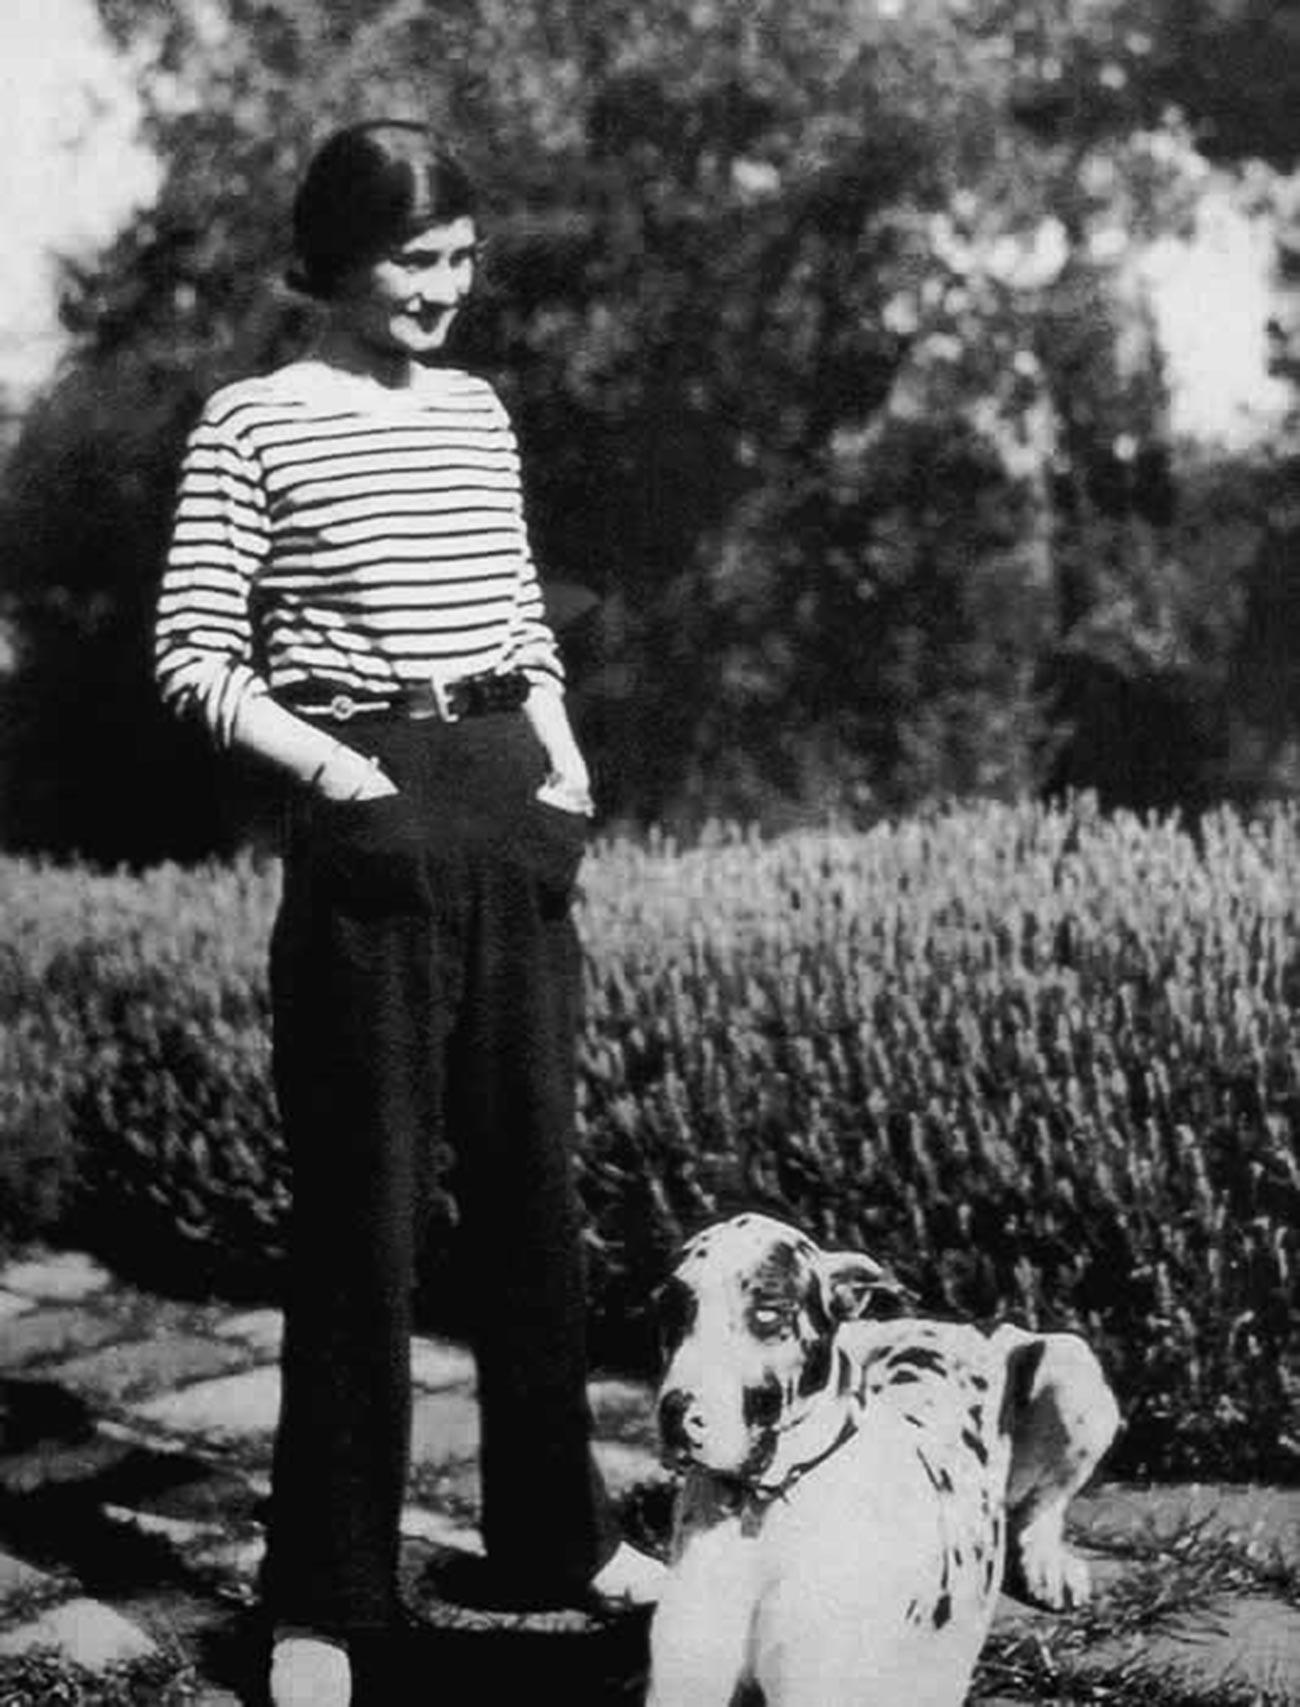 Gabrielle Chanel in a marinière, in the interwar period